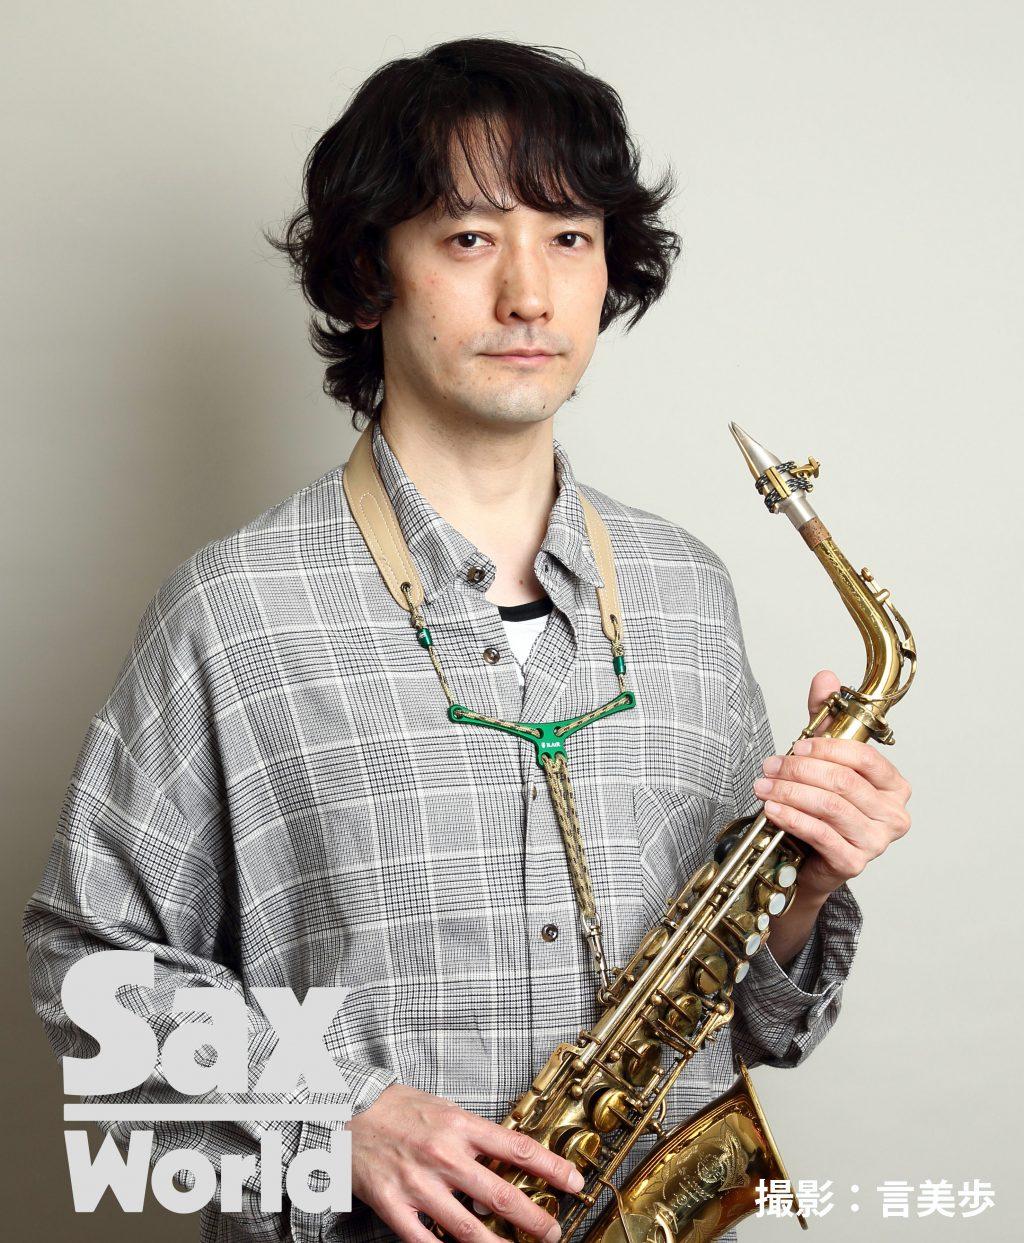 Sunaga t Experience、BLU-SWING作品への参加でも話題のサックス奏者 ...